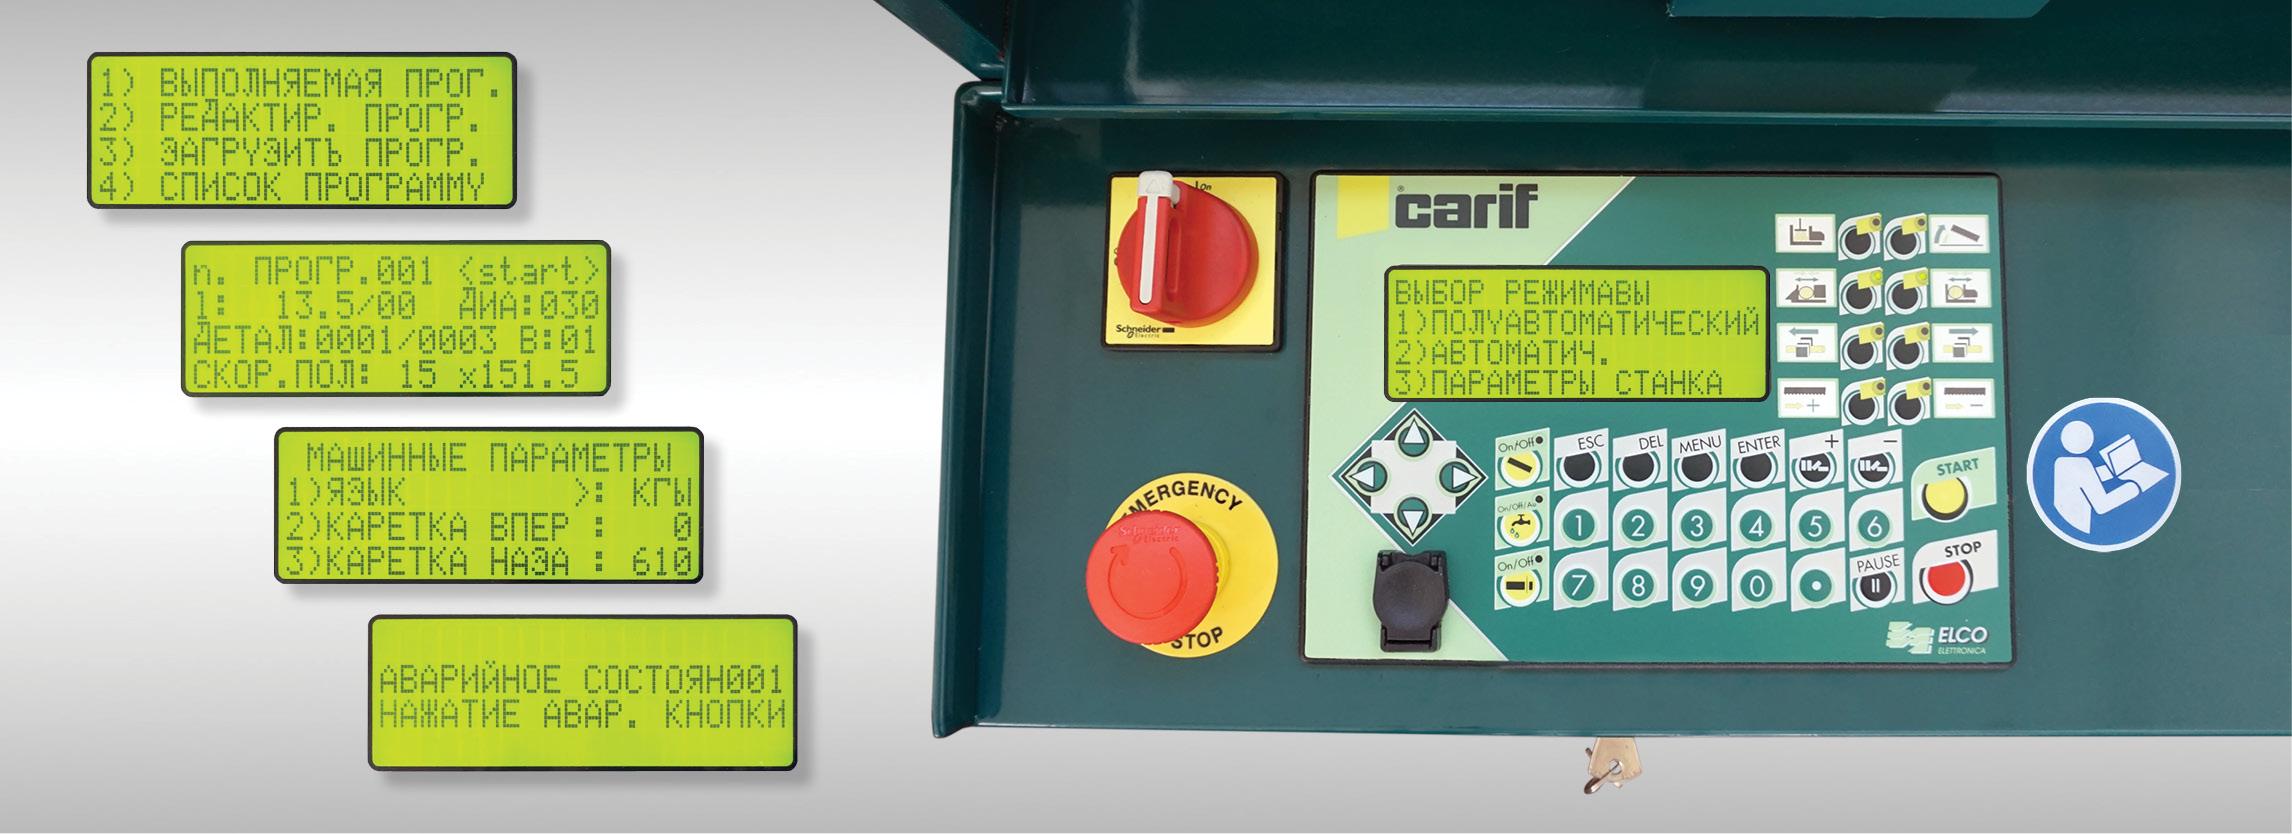 slide-display-ba-cnc_ru